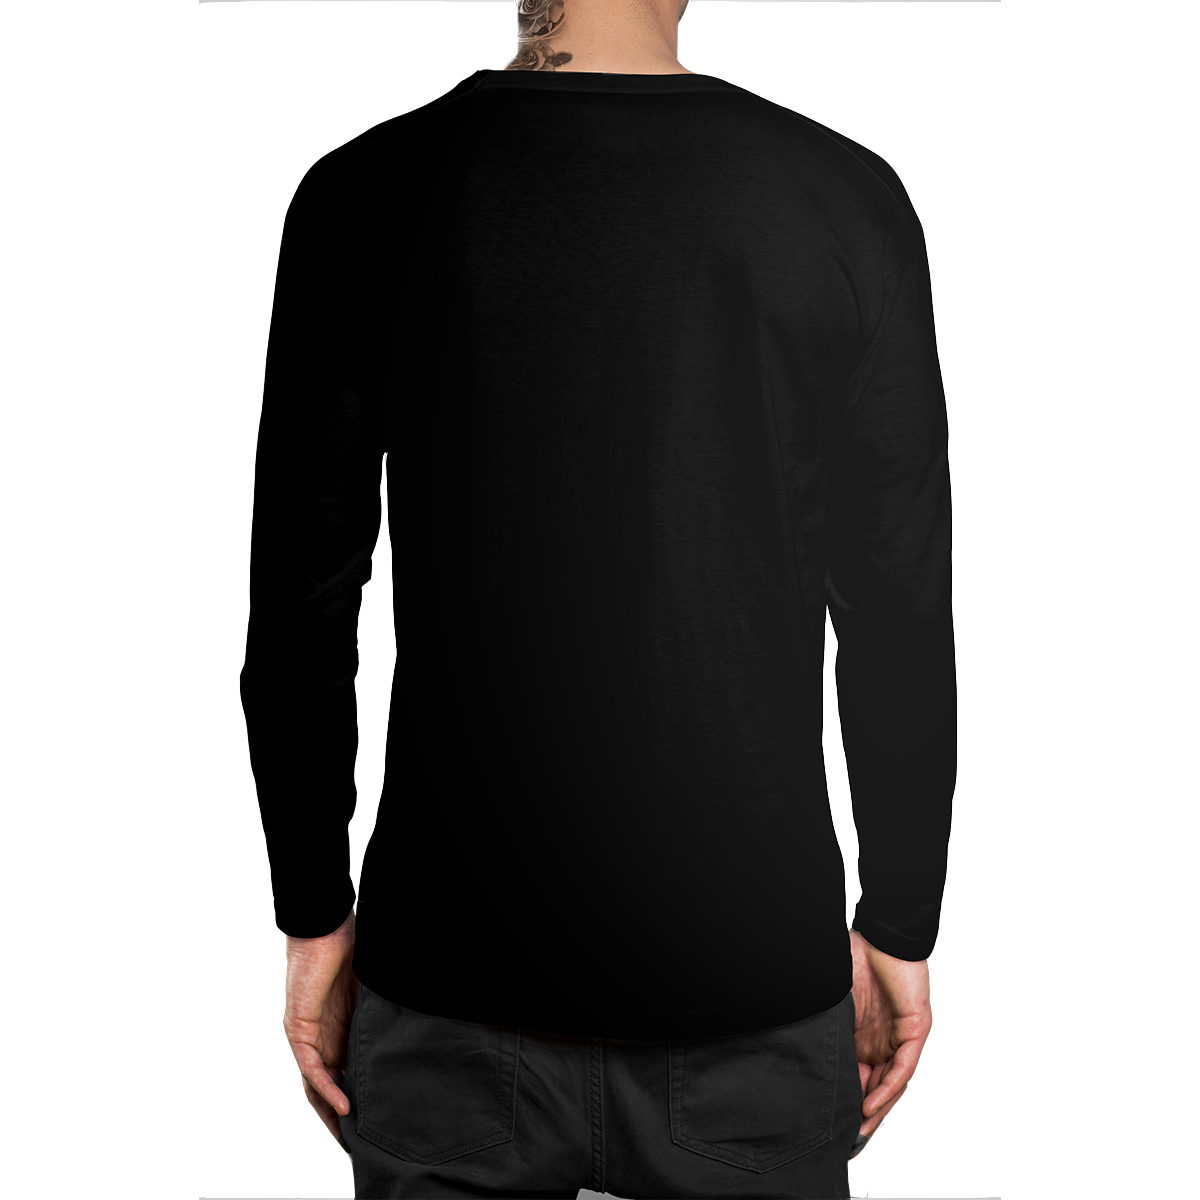 Stompy Camiseta Manga Longa Modelo 09